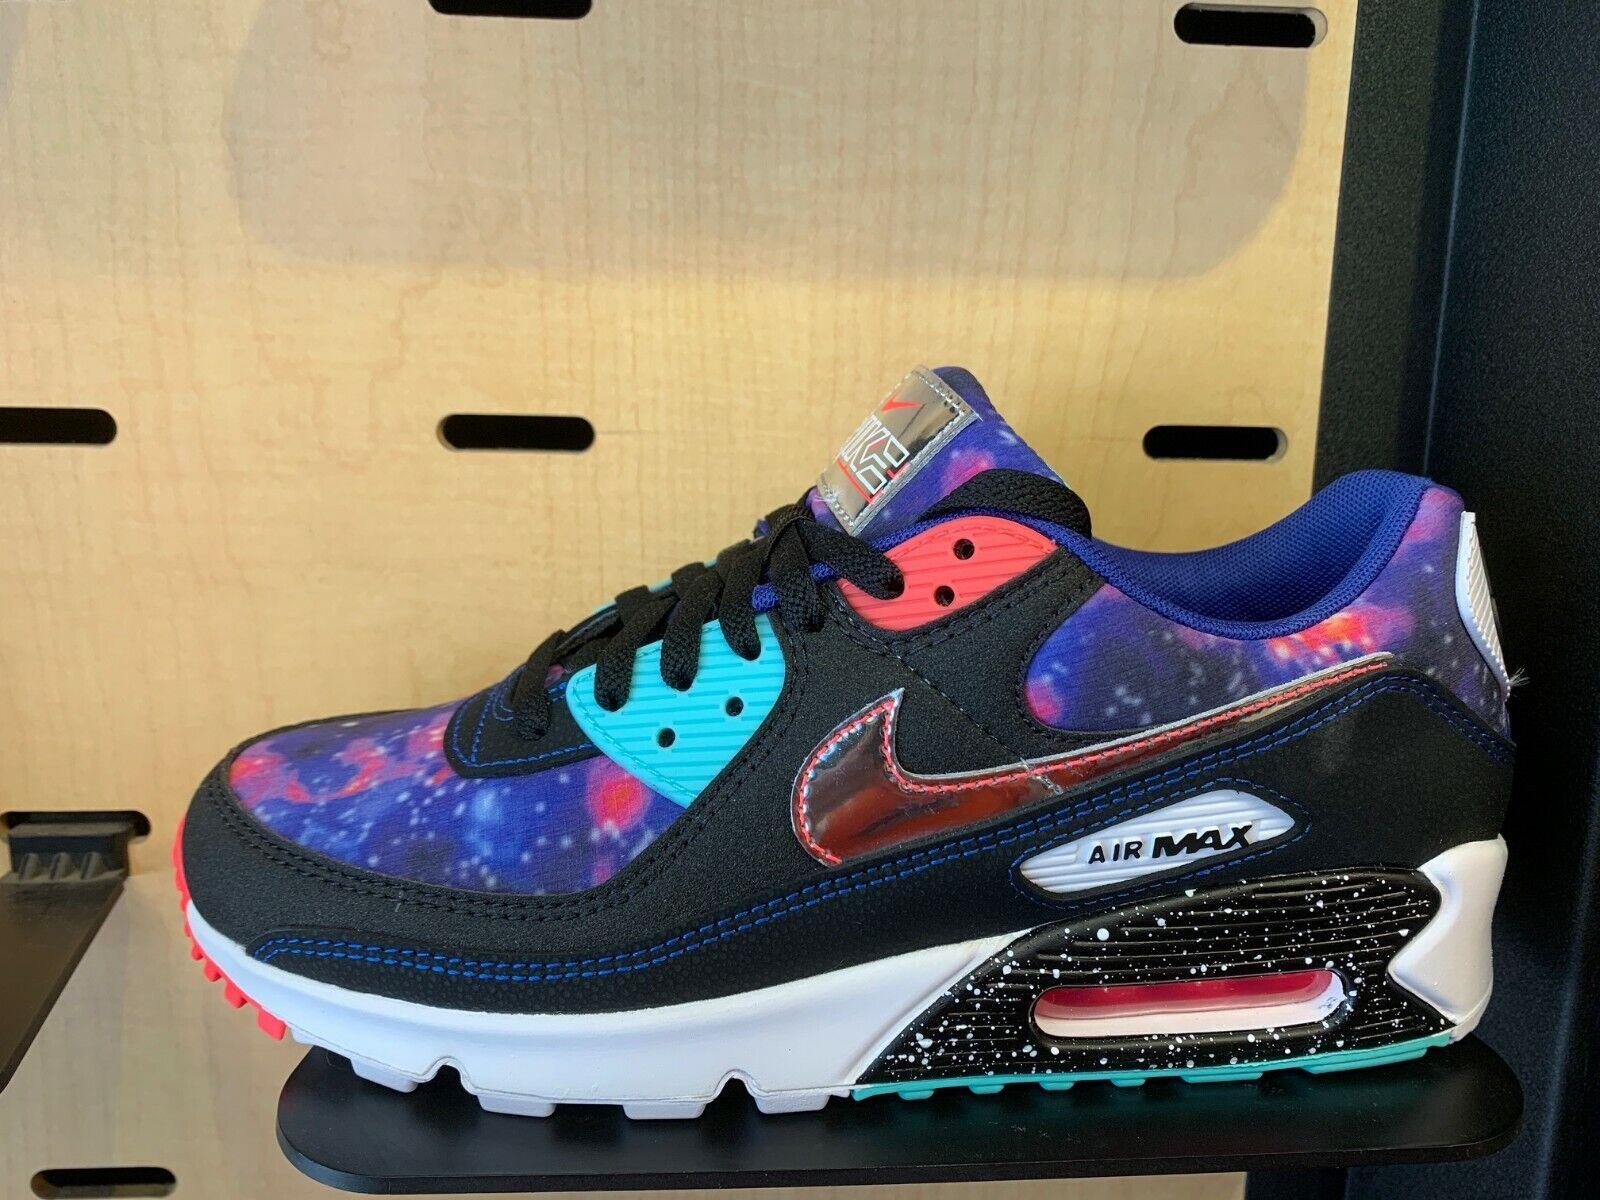 Nike Air Max 90 Supernova Cw6018 001 Mens Size 8 Limited Nrg Qs